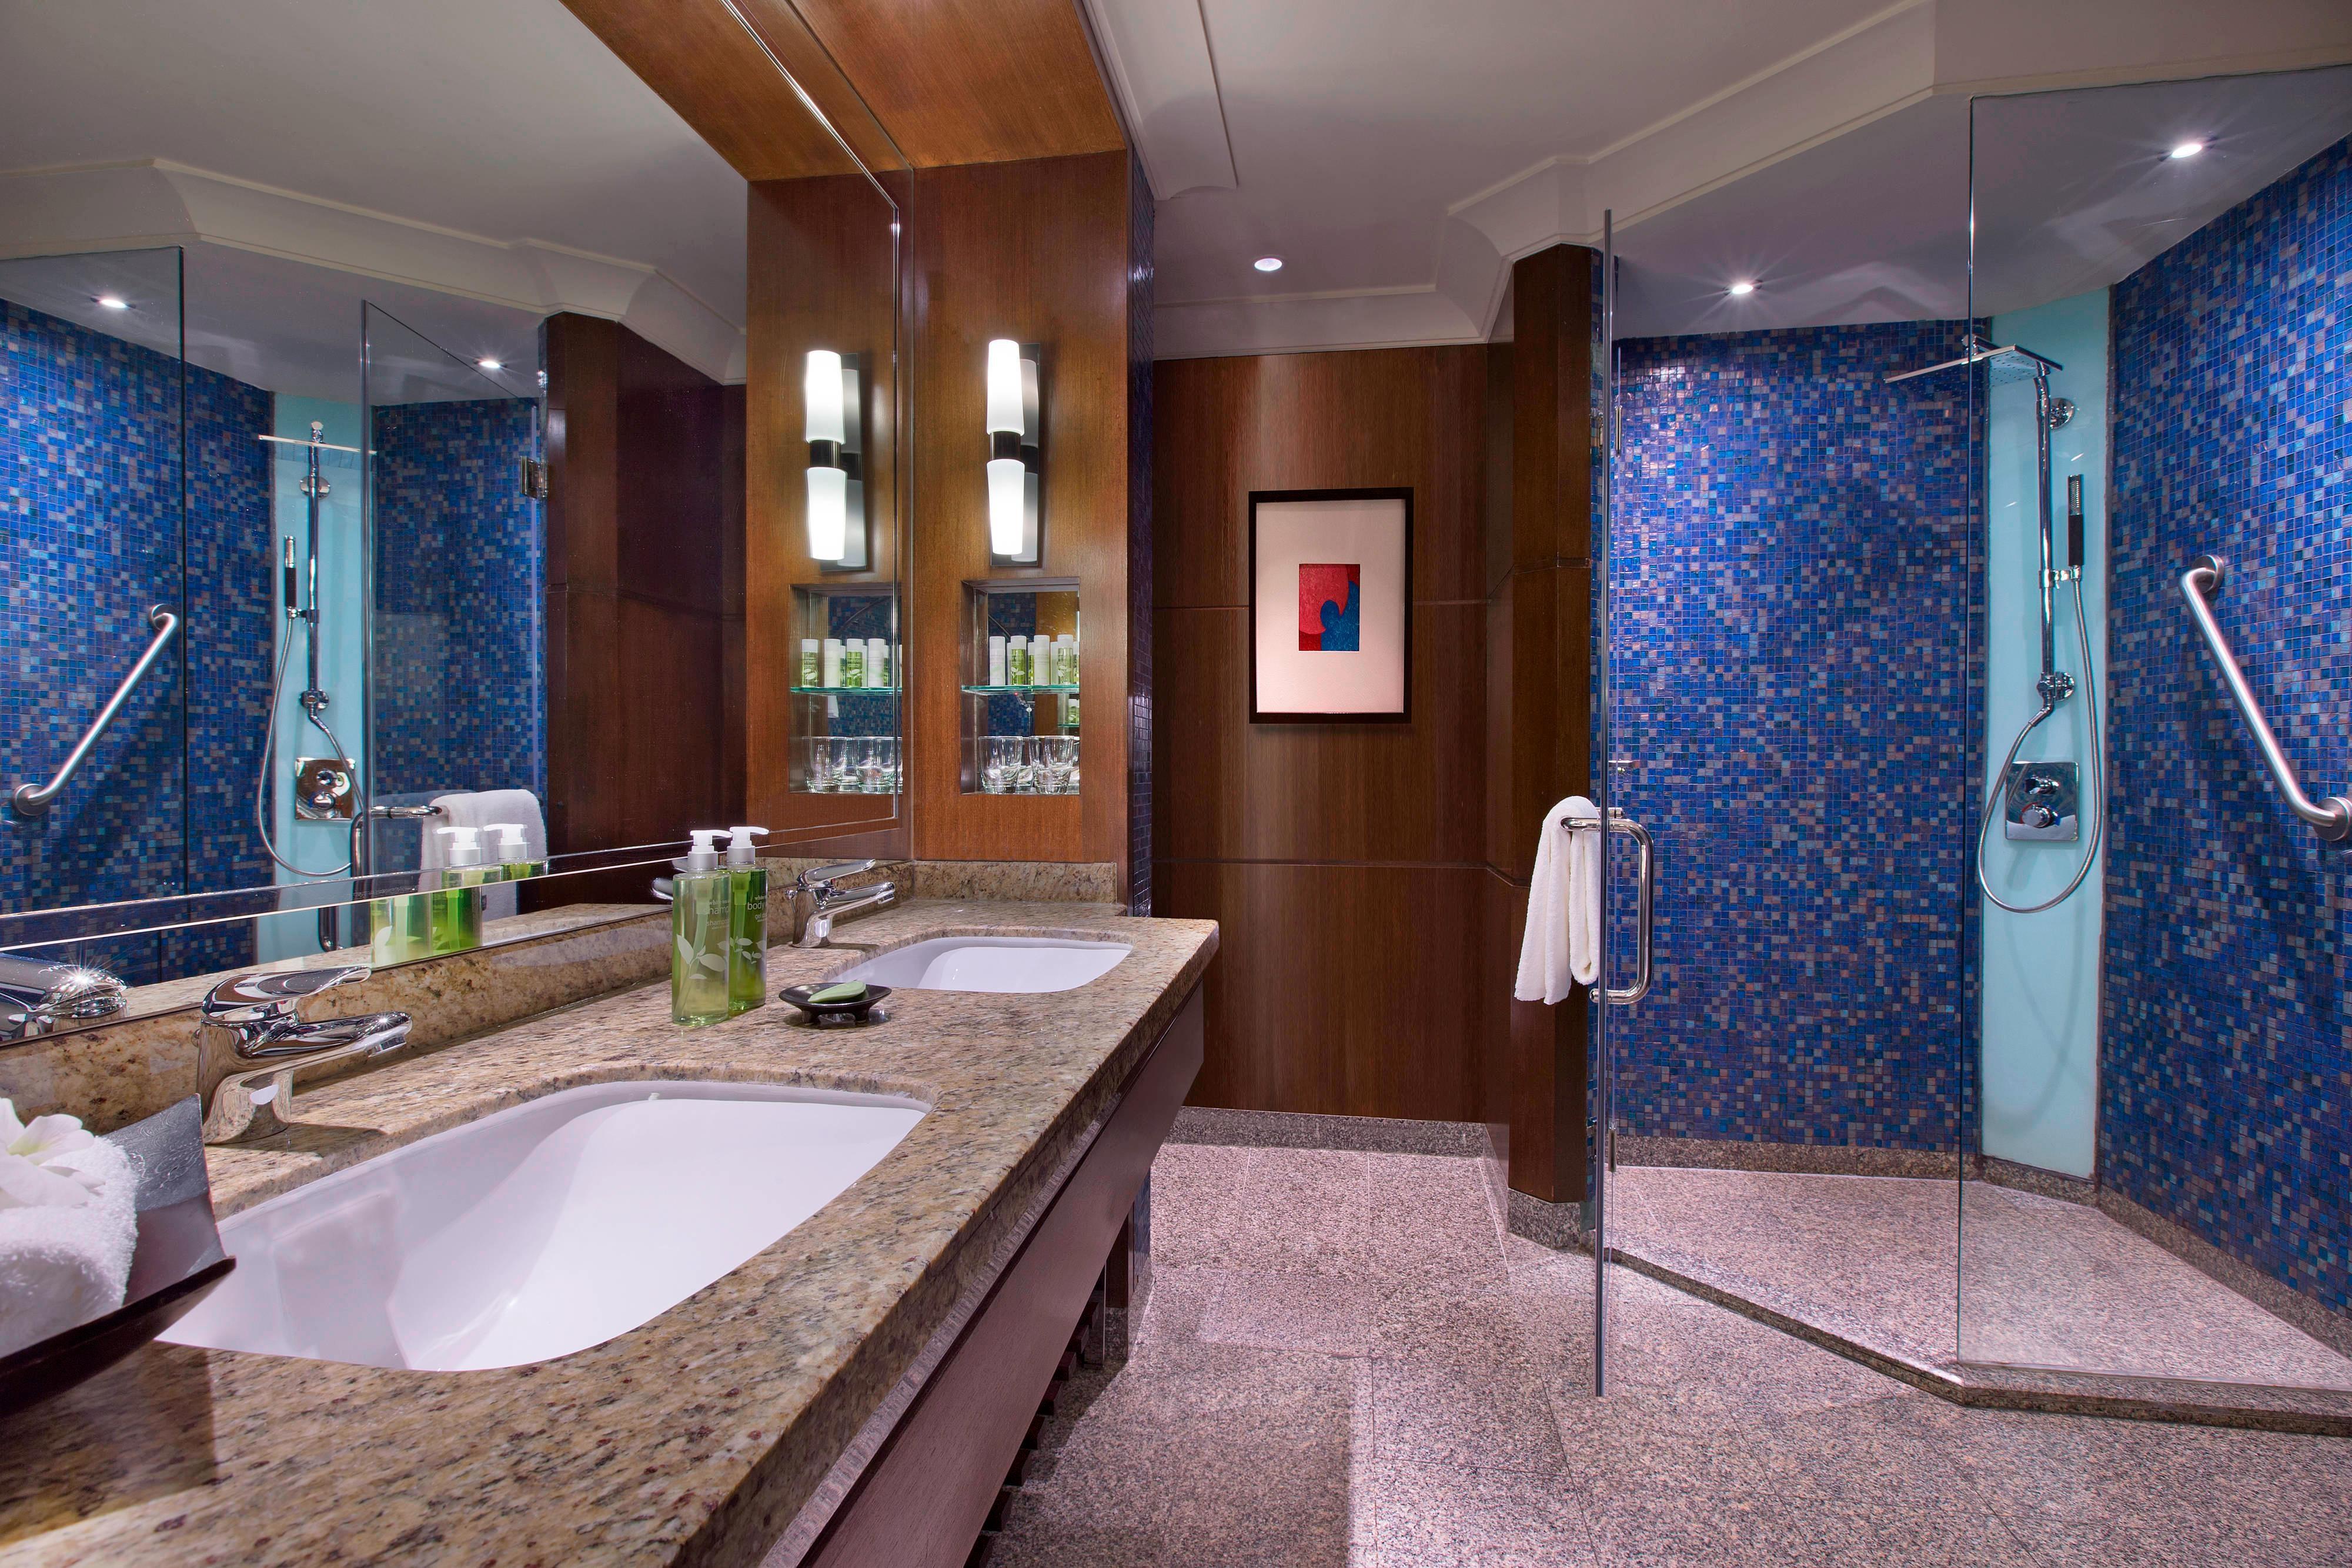 Westin Executive Club - Suite - Bathroom